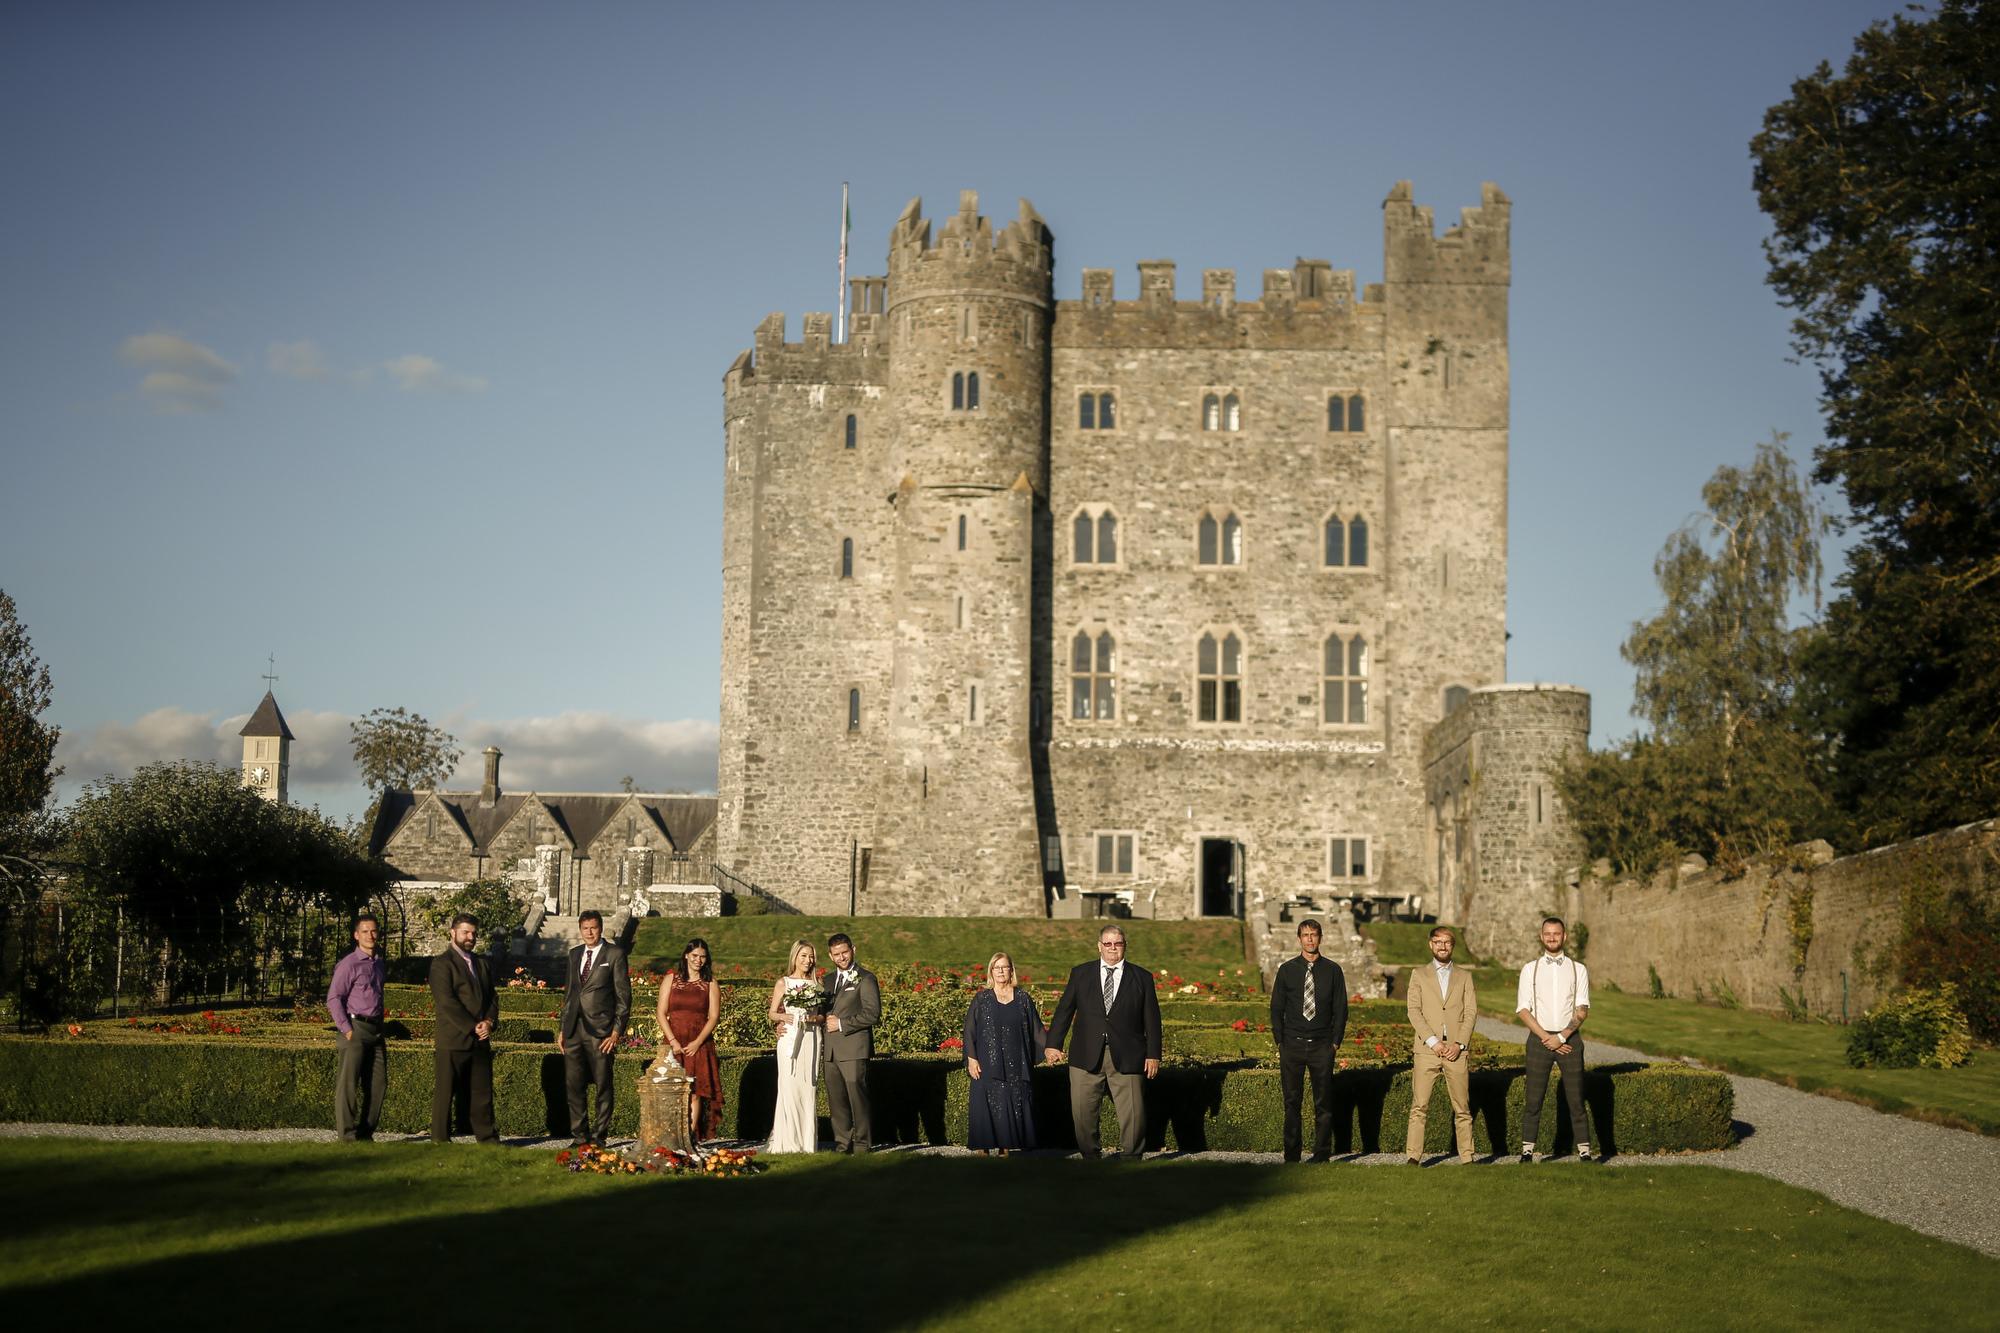 kilkea_castle_wedding_photographer_goldenmoments_052.jpg